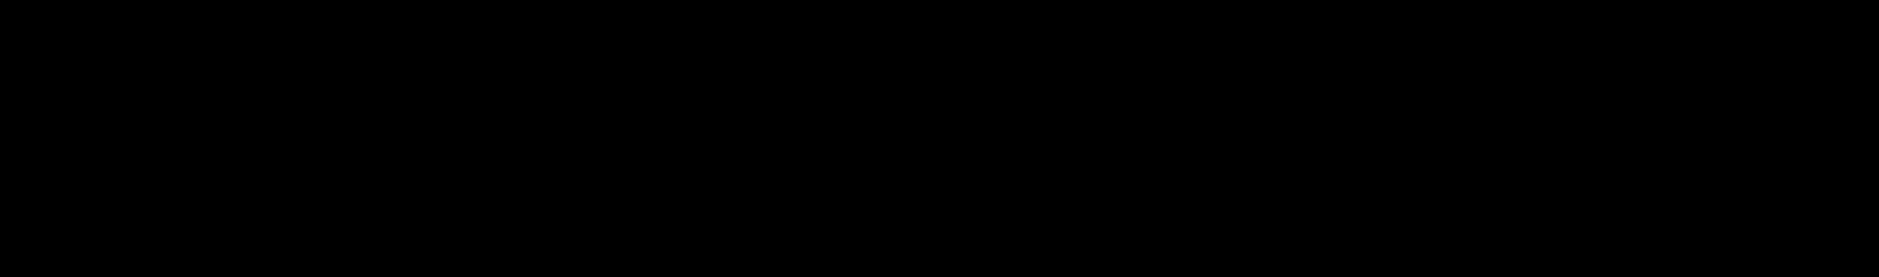 RecentLossIndex_Formula